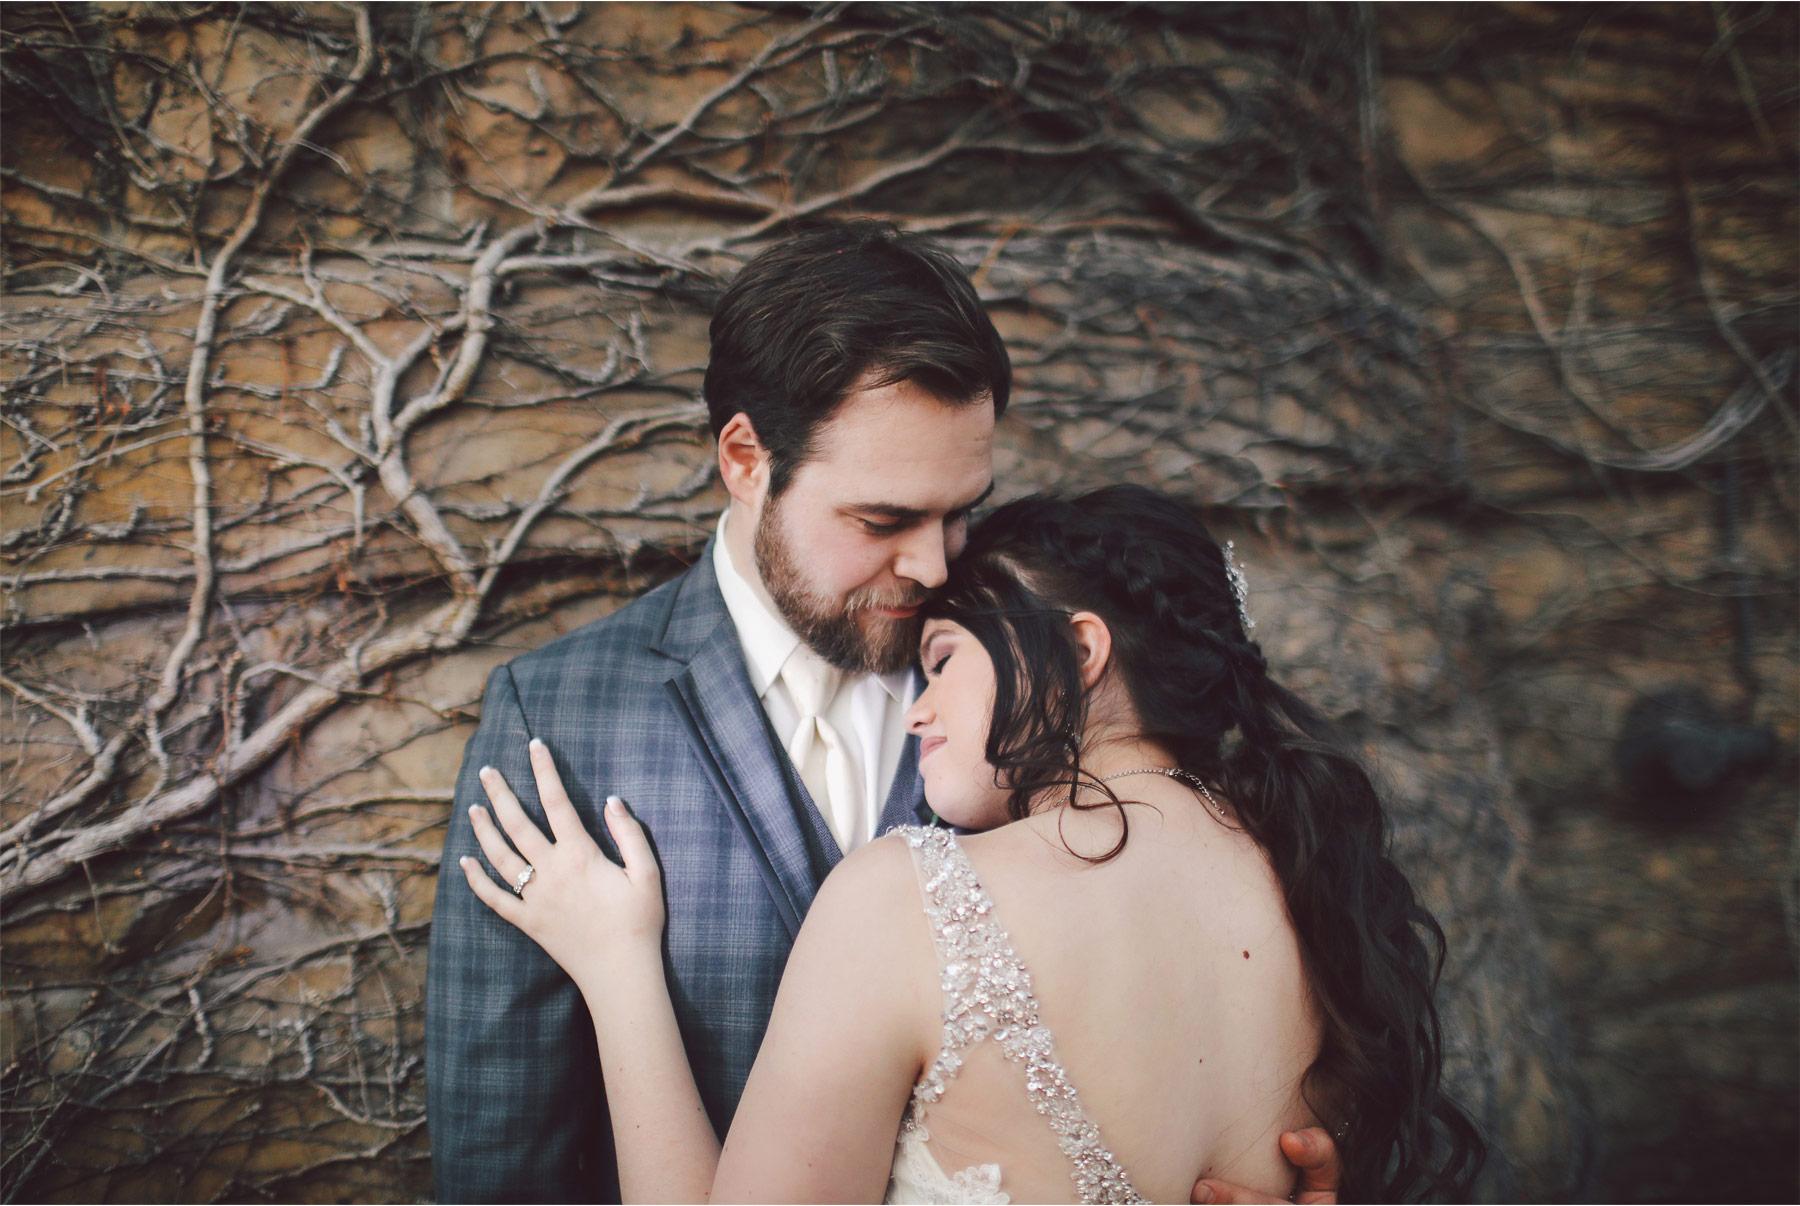 19-Minneapolis-Wedding-Photography-by-Vick-Photography-Historic-Concord-Exchange-Rachael-and-Benjamin.jpg